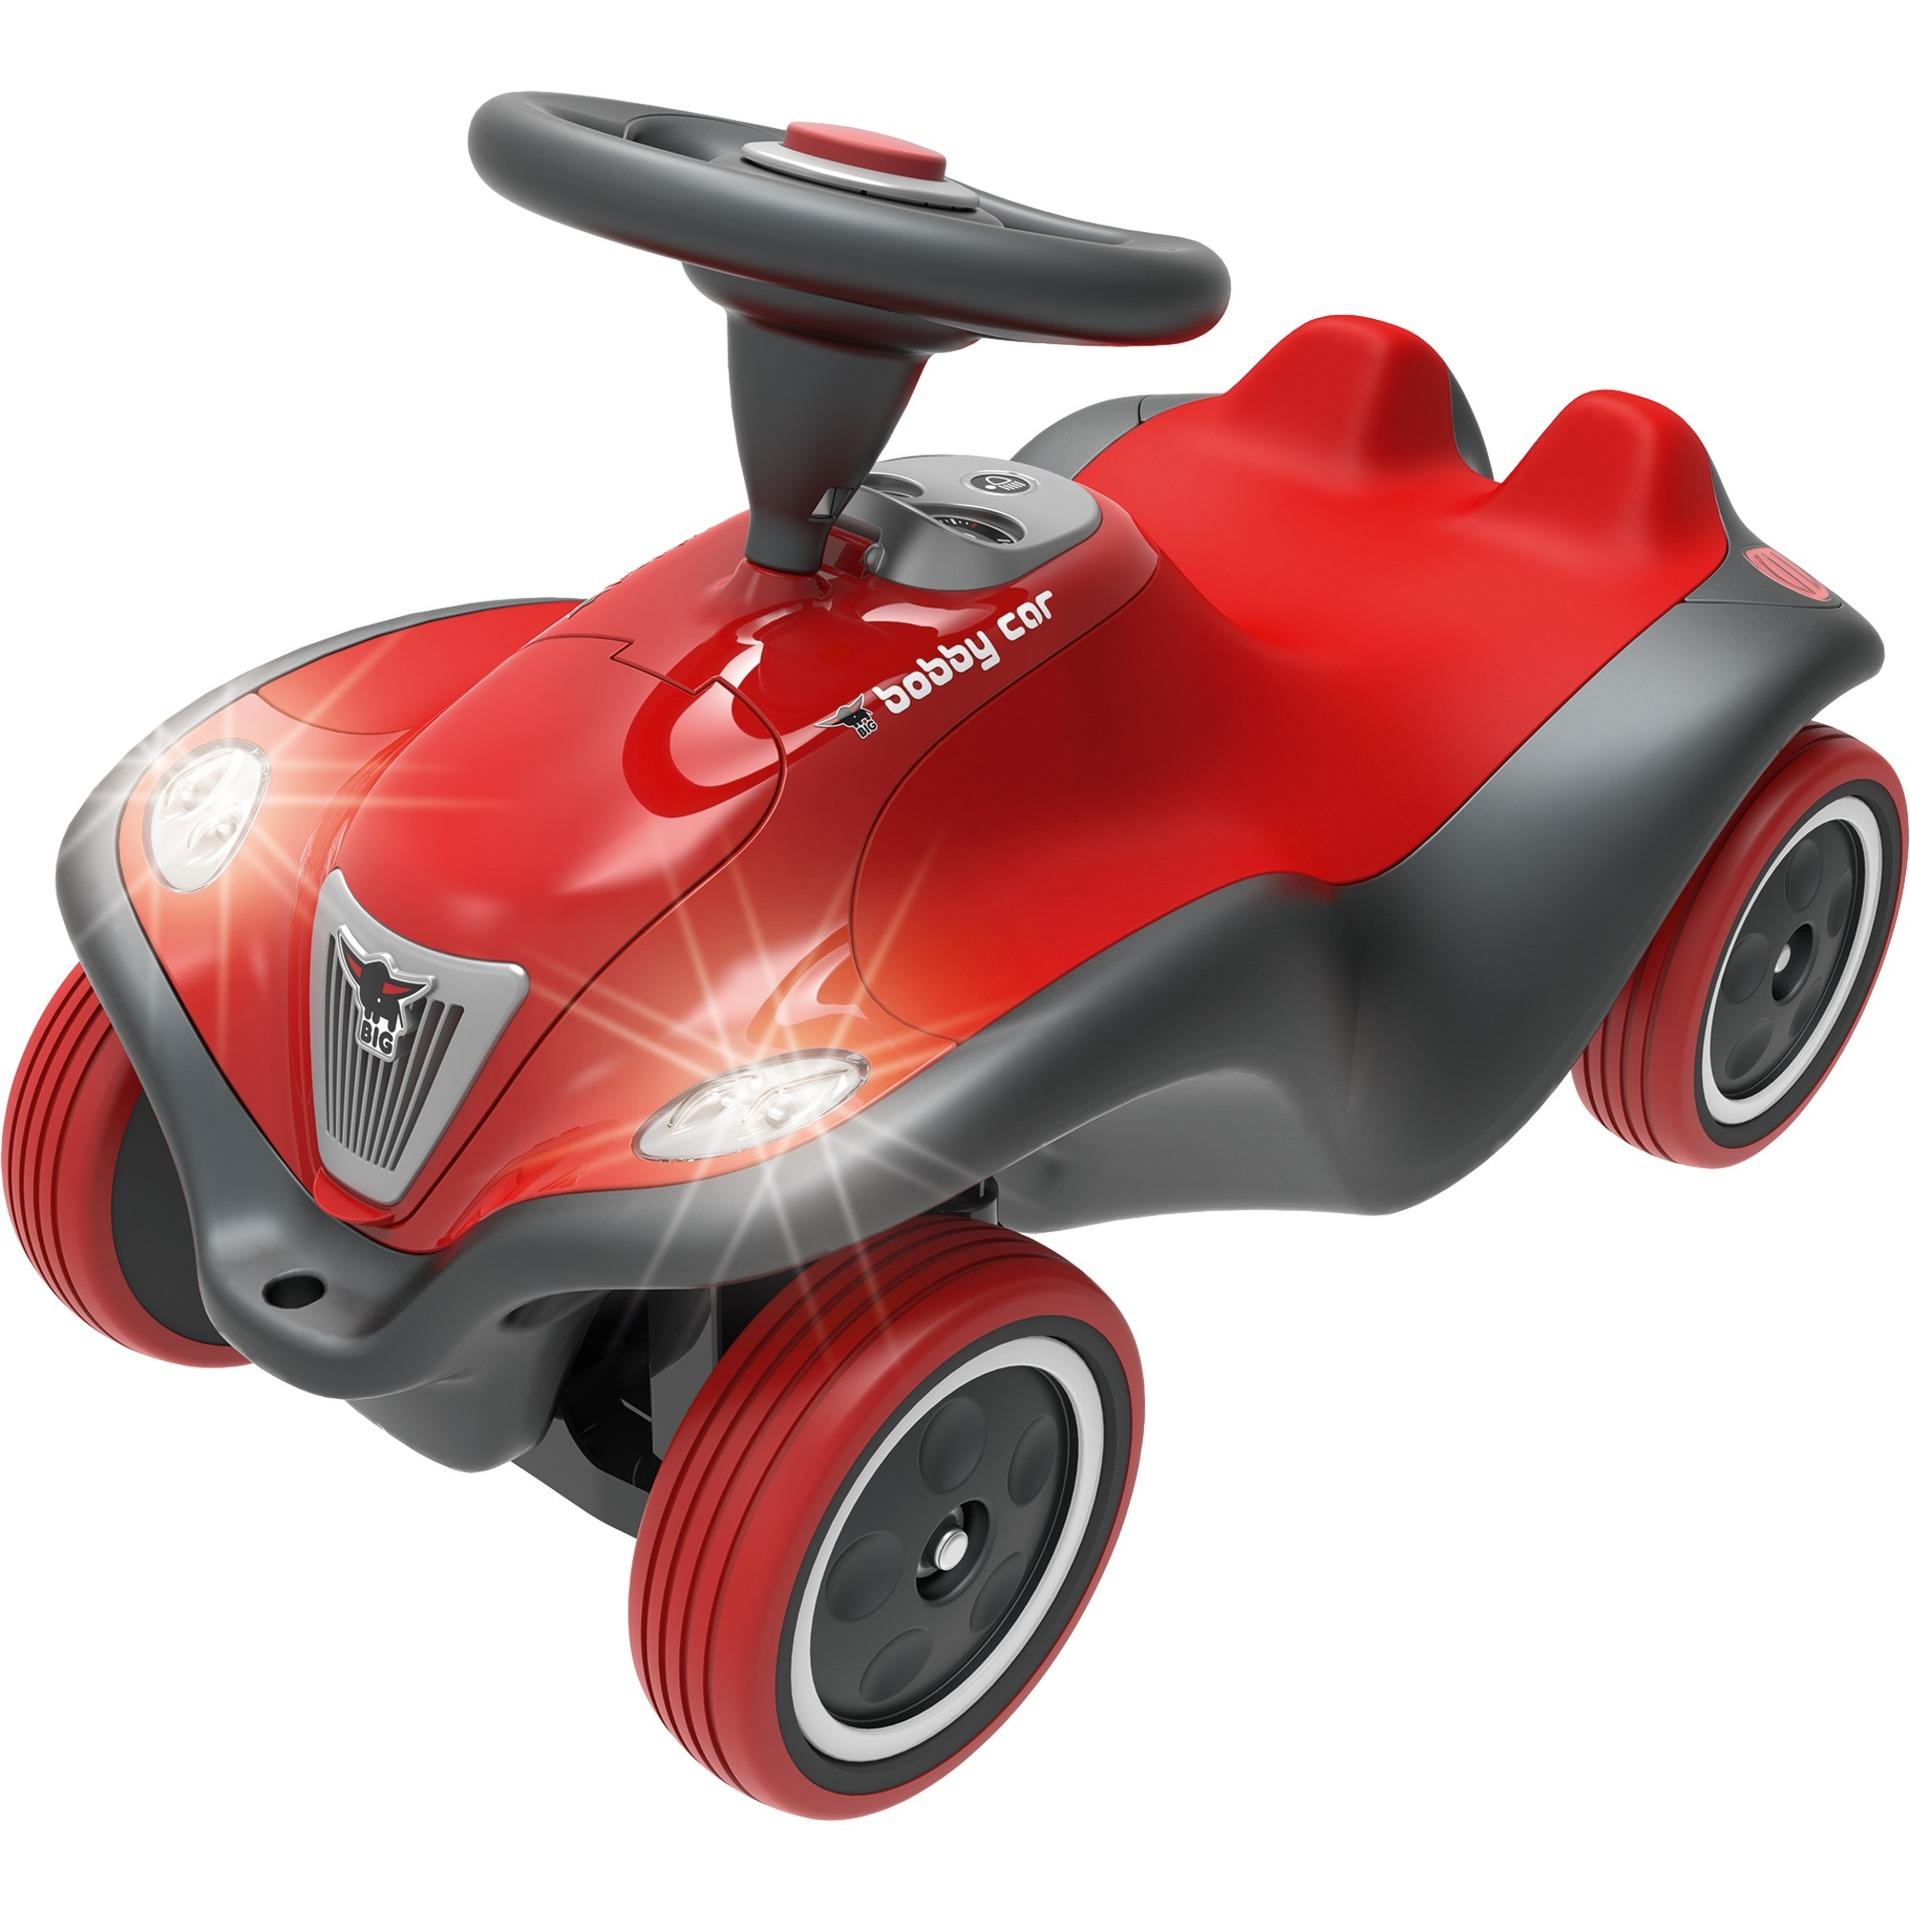 800056230 no categorizado, Automóvil de juguete